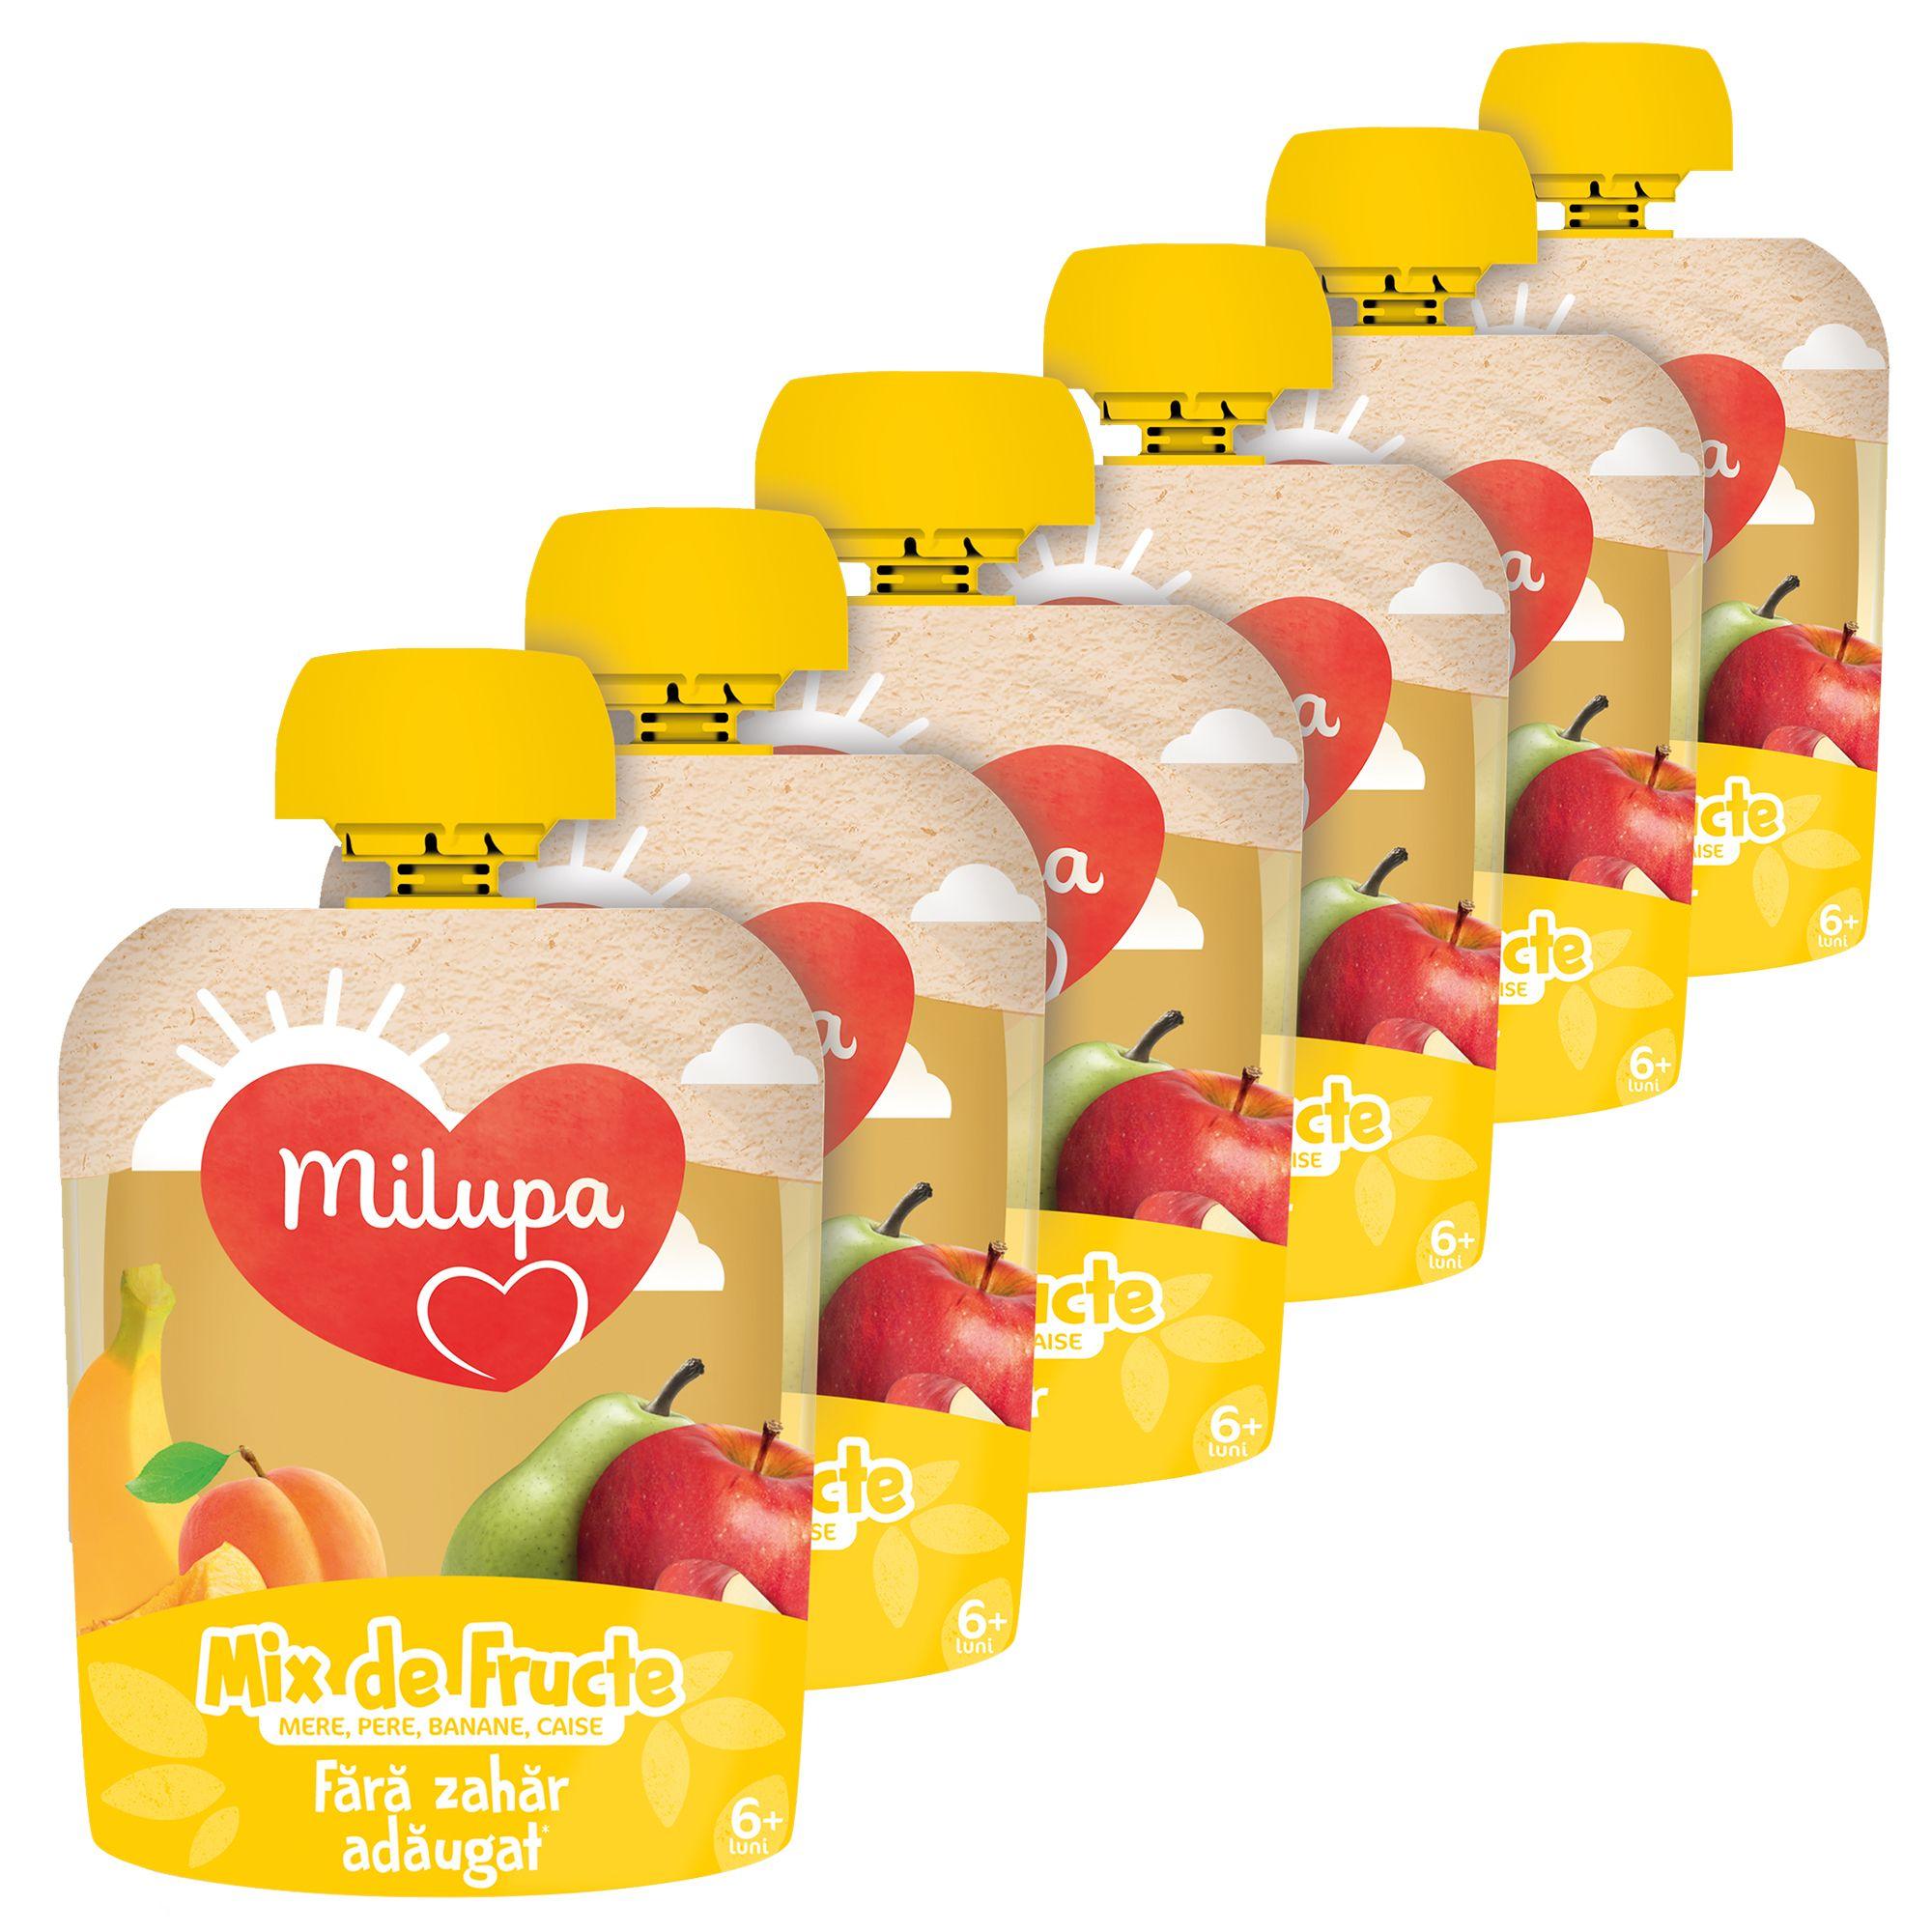 Pachet 6 x Piure de Fructe(mere, pere, banana, caise), Milupa, 90g